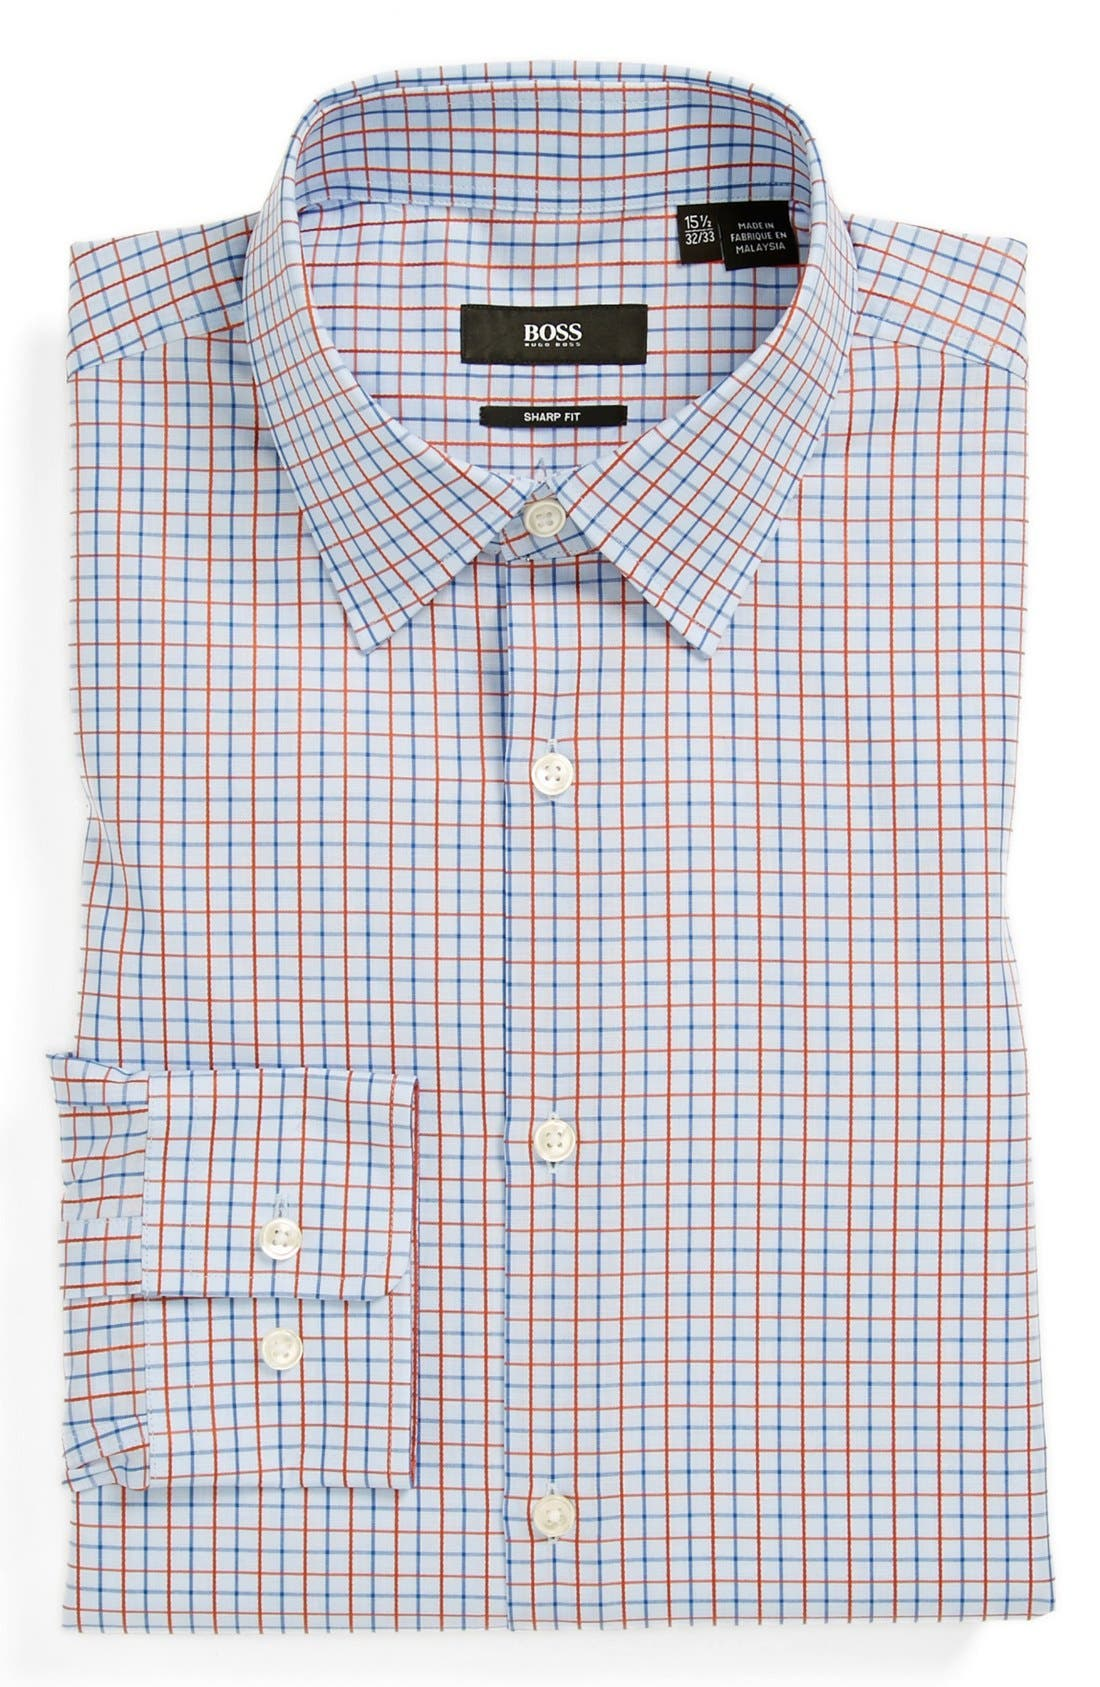 Main Image - BOSS HUGO BOSS 'Marlow' Sharp Fit Dress Shirt